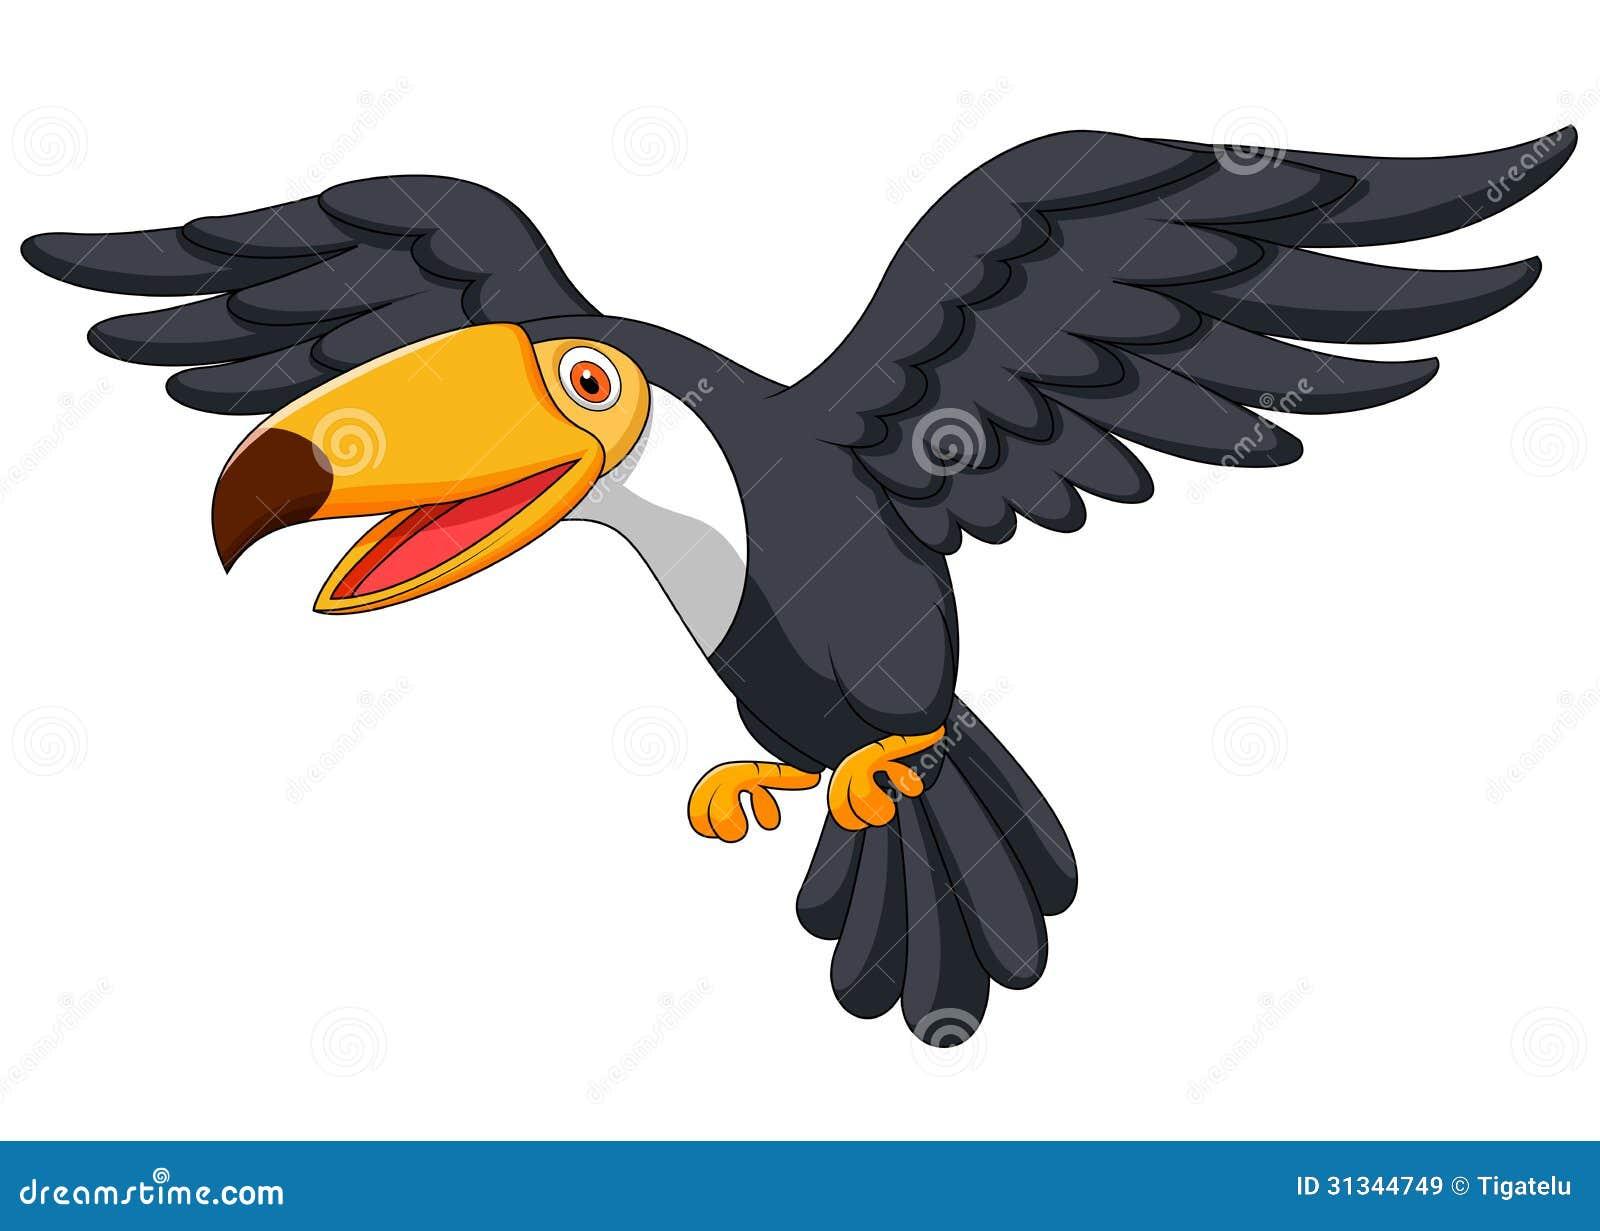 Toucan Bird Cartoon Flying Stock Vector. Image Of Animated